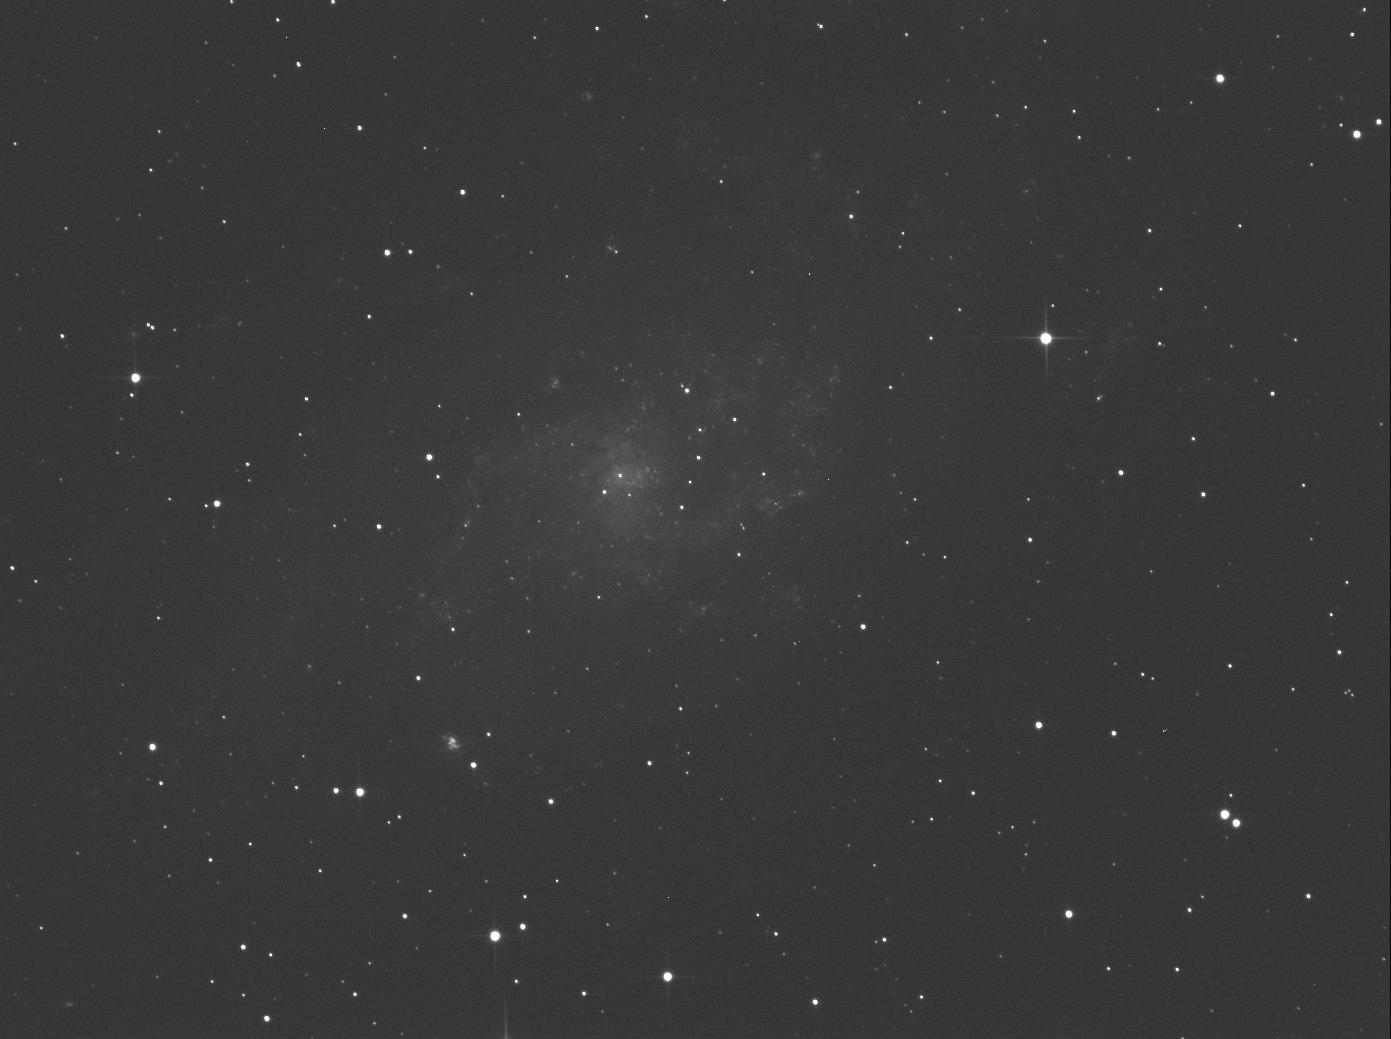 Forums d'astronomie Webastro - [Gal] Atik 314l